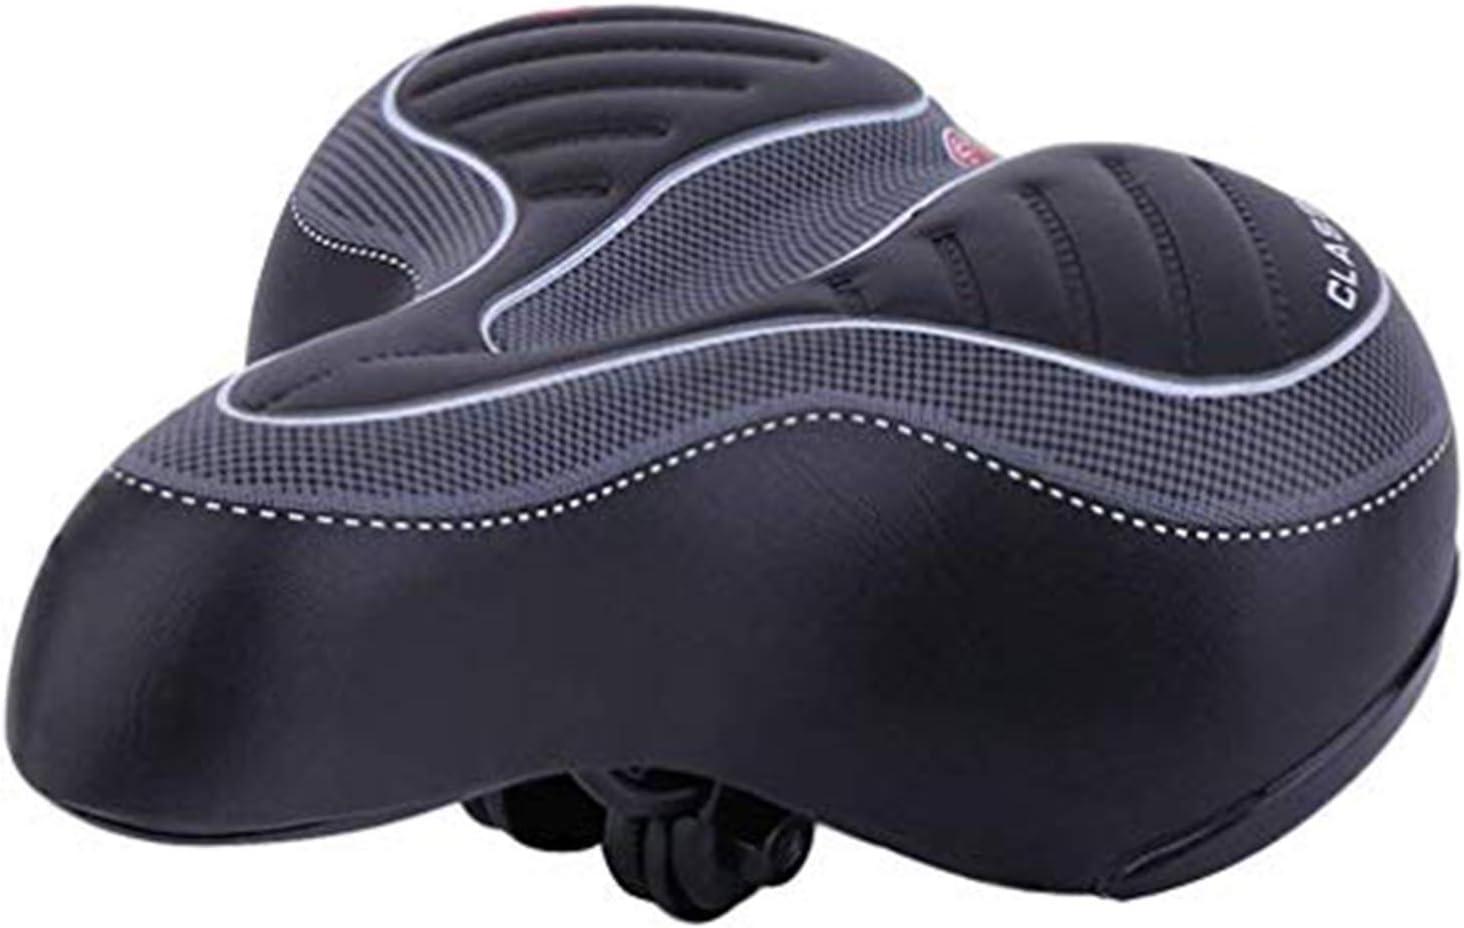 US Big Bum Bicycle Curiser Bike Saddle Seat Extra Wide Cycling Soft Pad Cushion